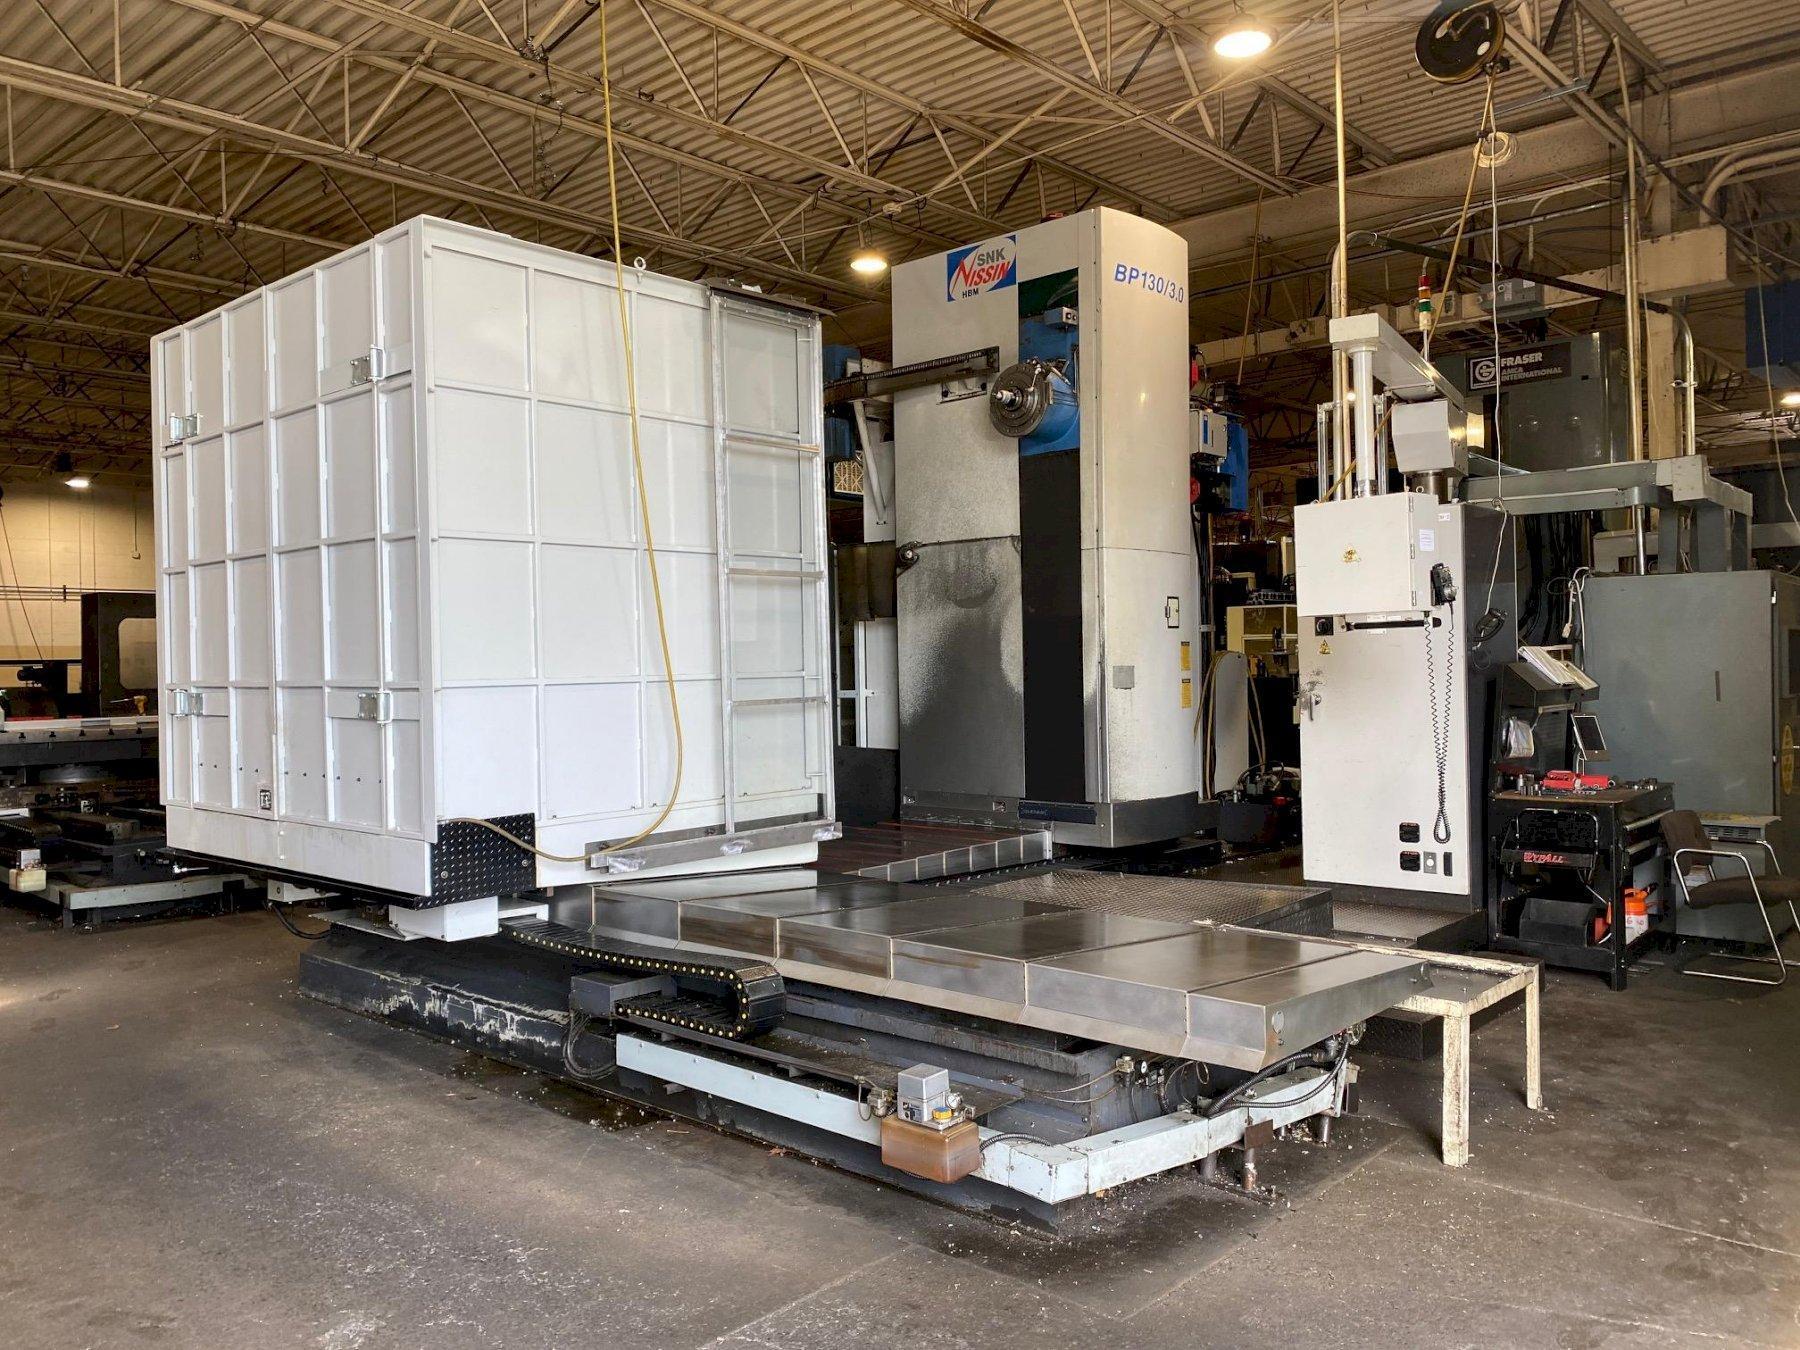 SNK NISSIN BP130/3.0 CNC Horizontal Boring Mill